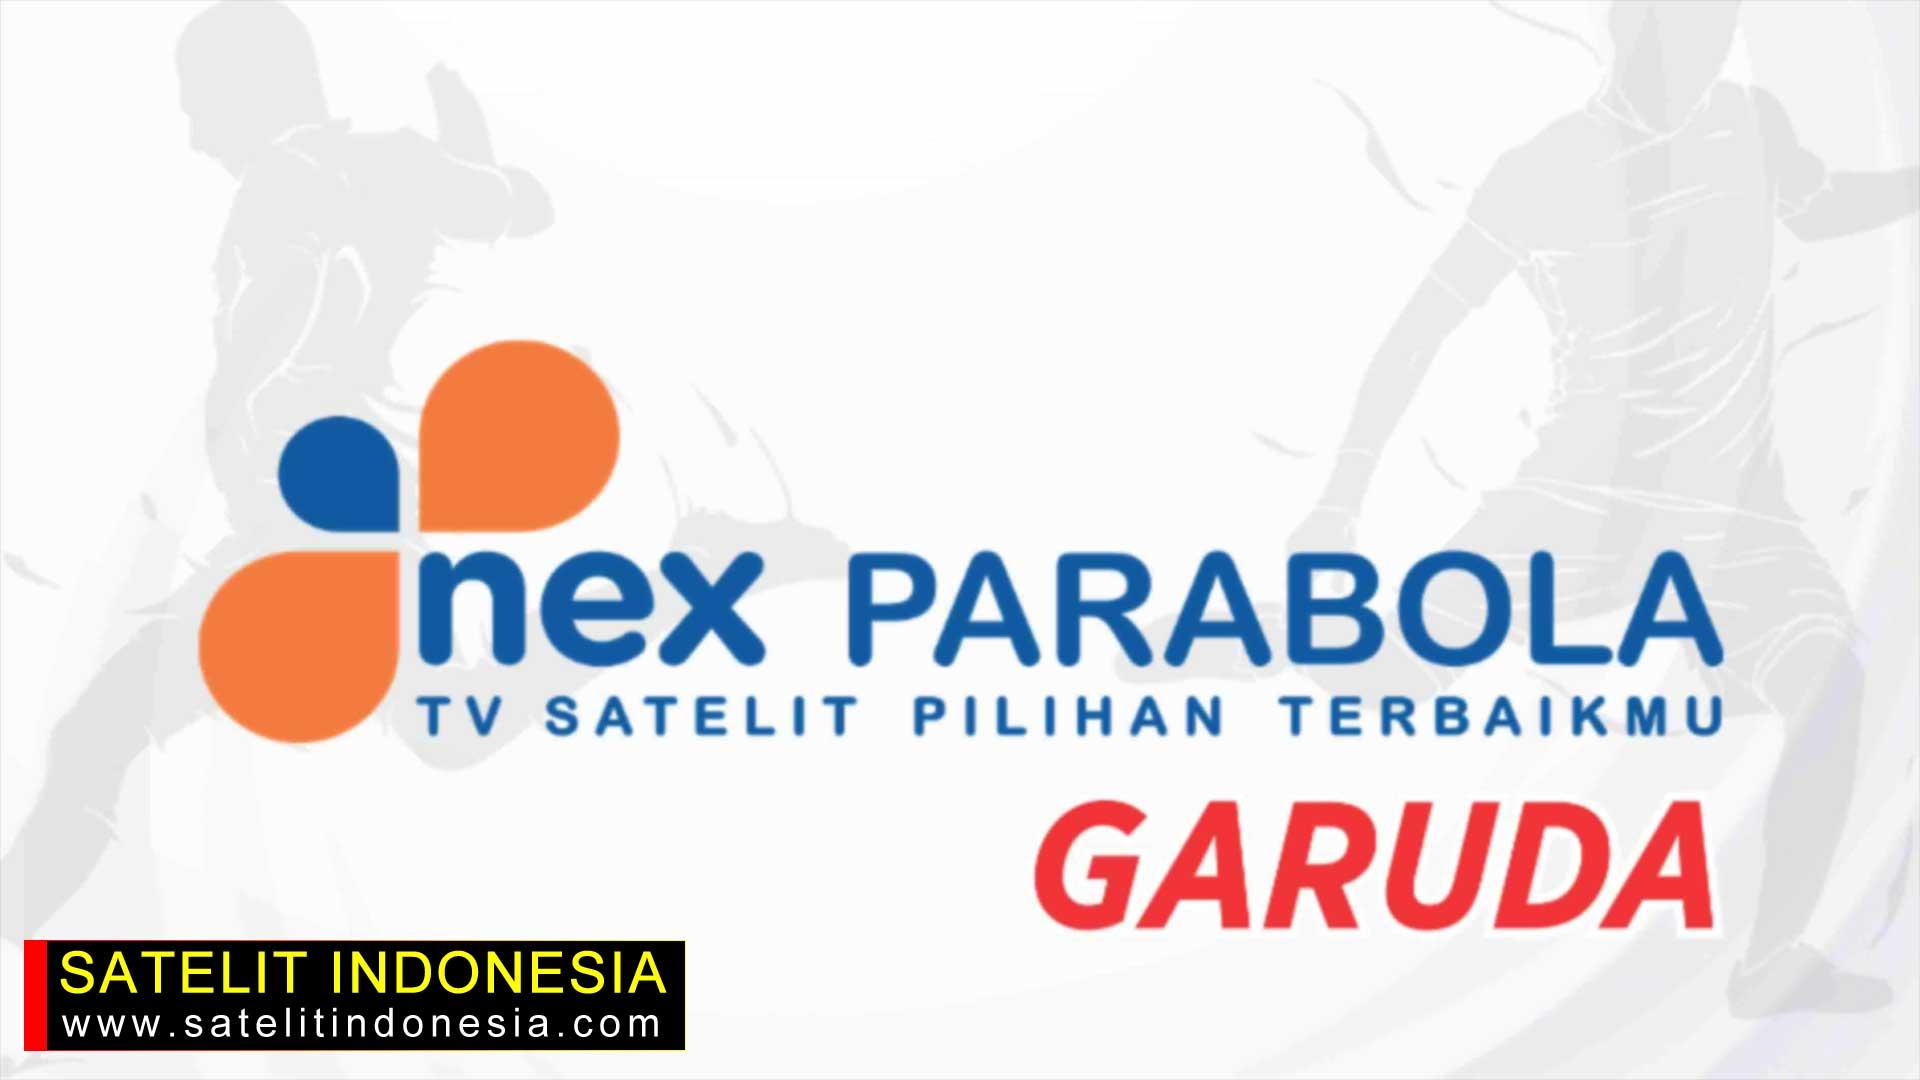 Download Firmware Nex Parabola Garuda G2 Update SW Terbaru